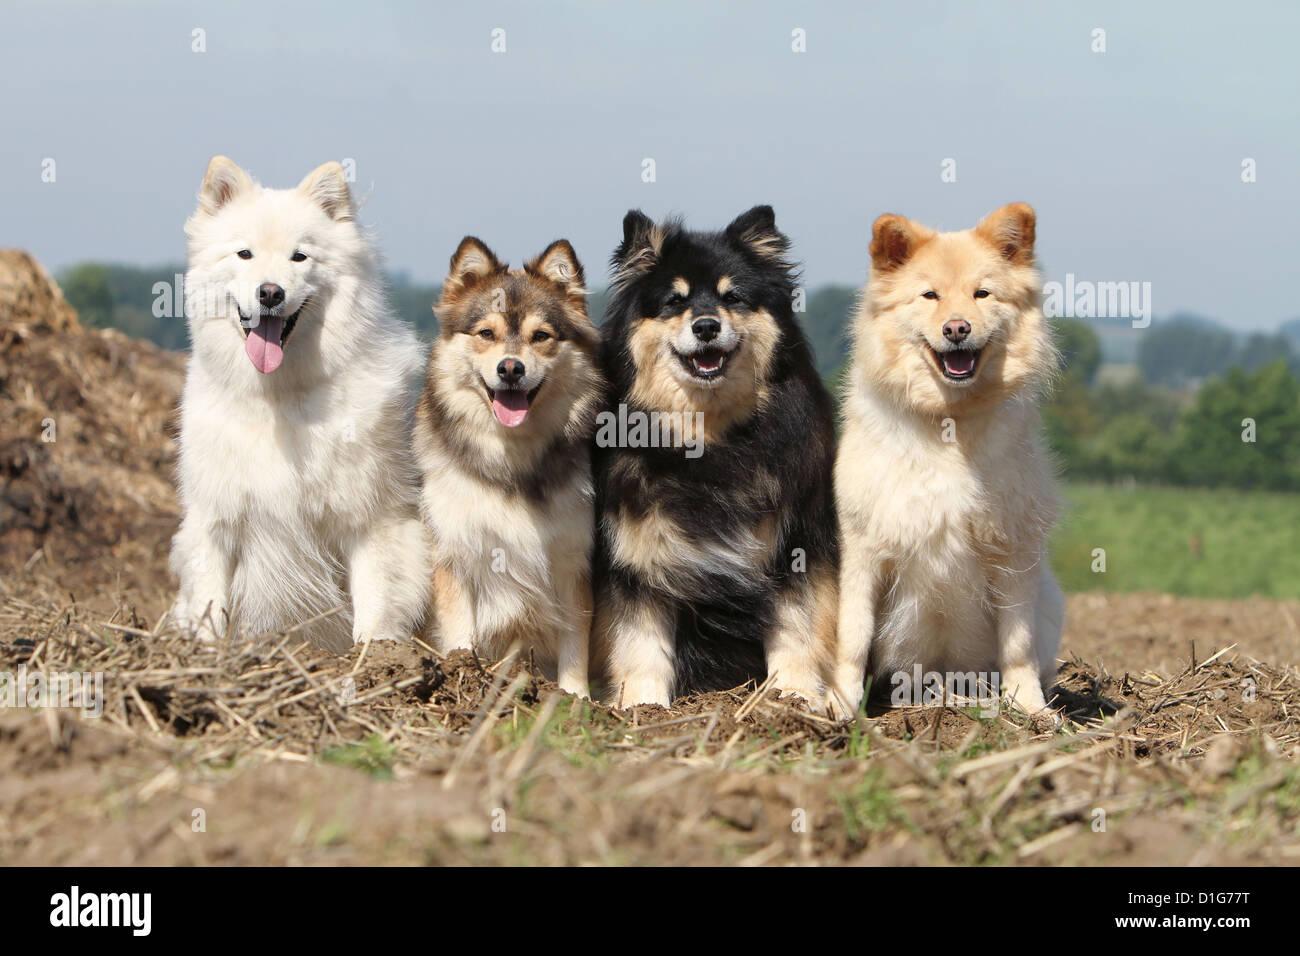 Dog Finnish Lapphund Adult Adults Lapinkoïra Chien Finnois